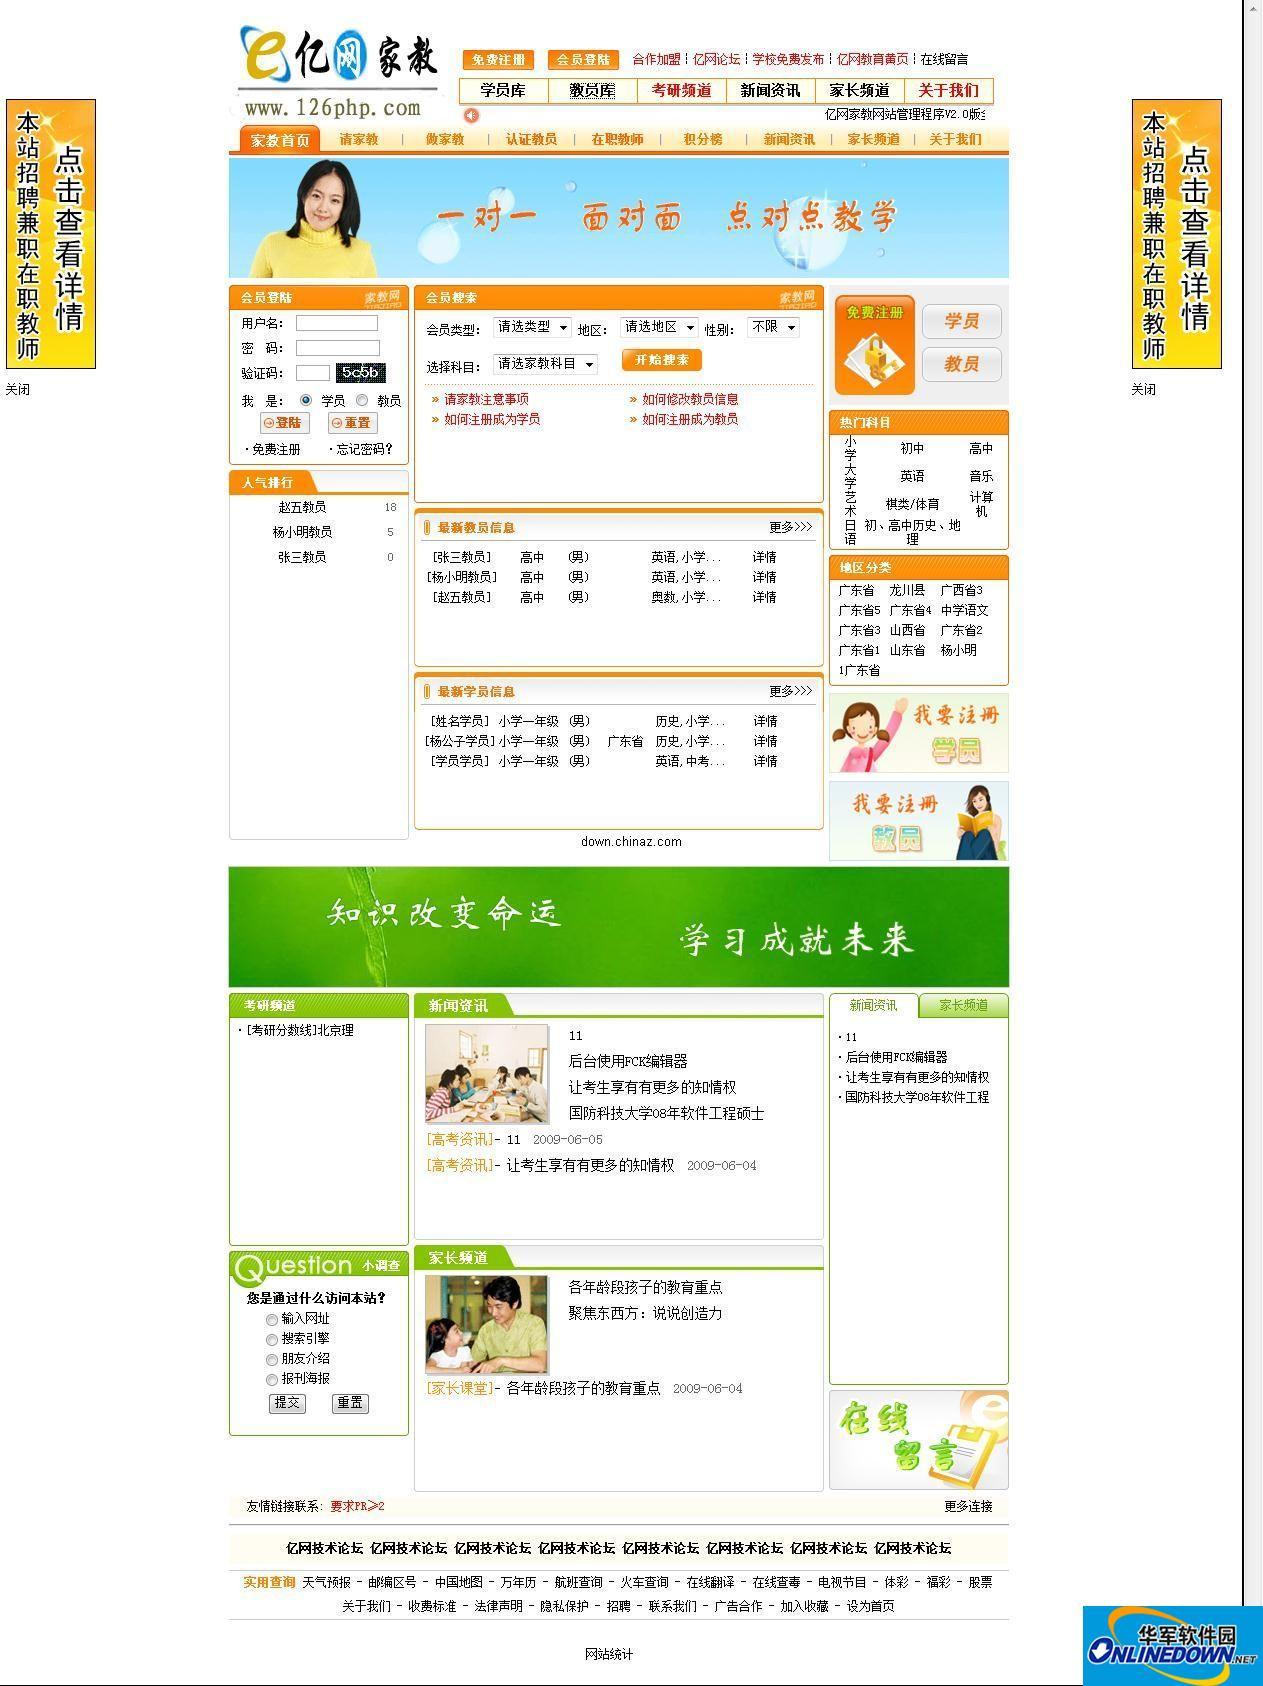 php 亿网家教网站管理程序 PC版